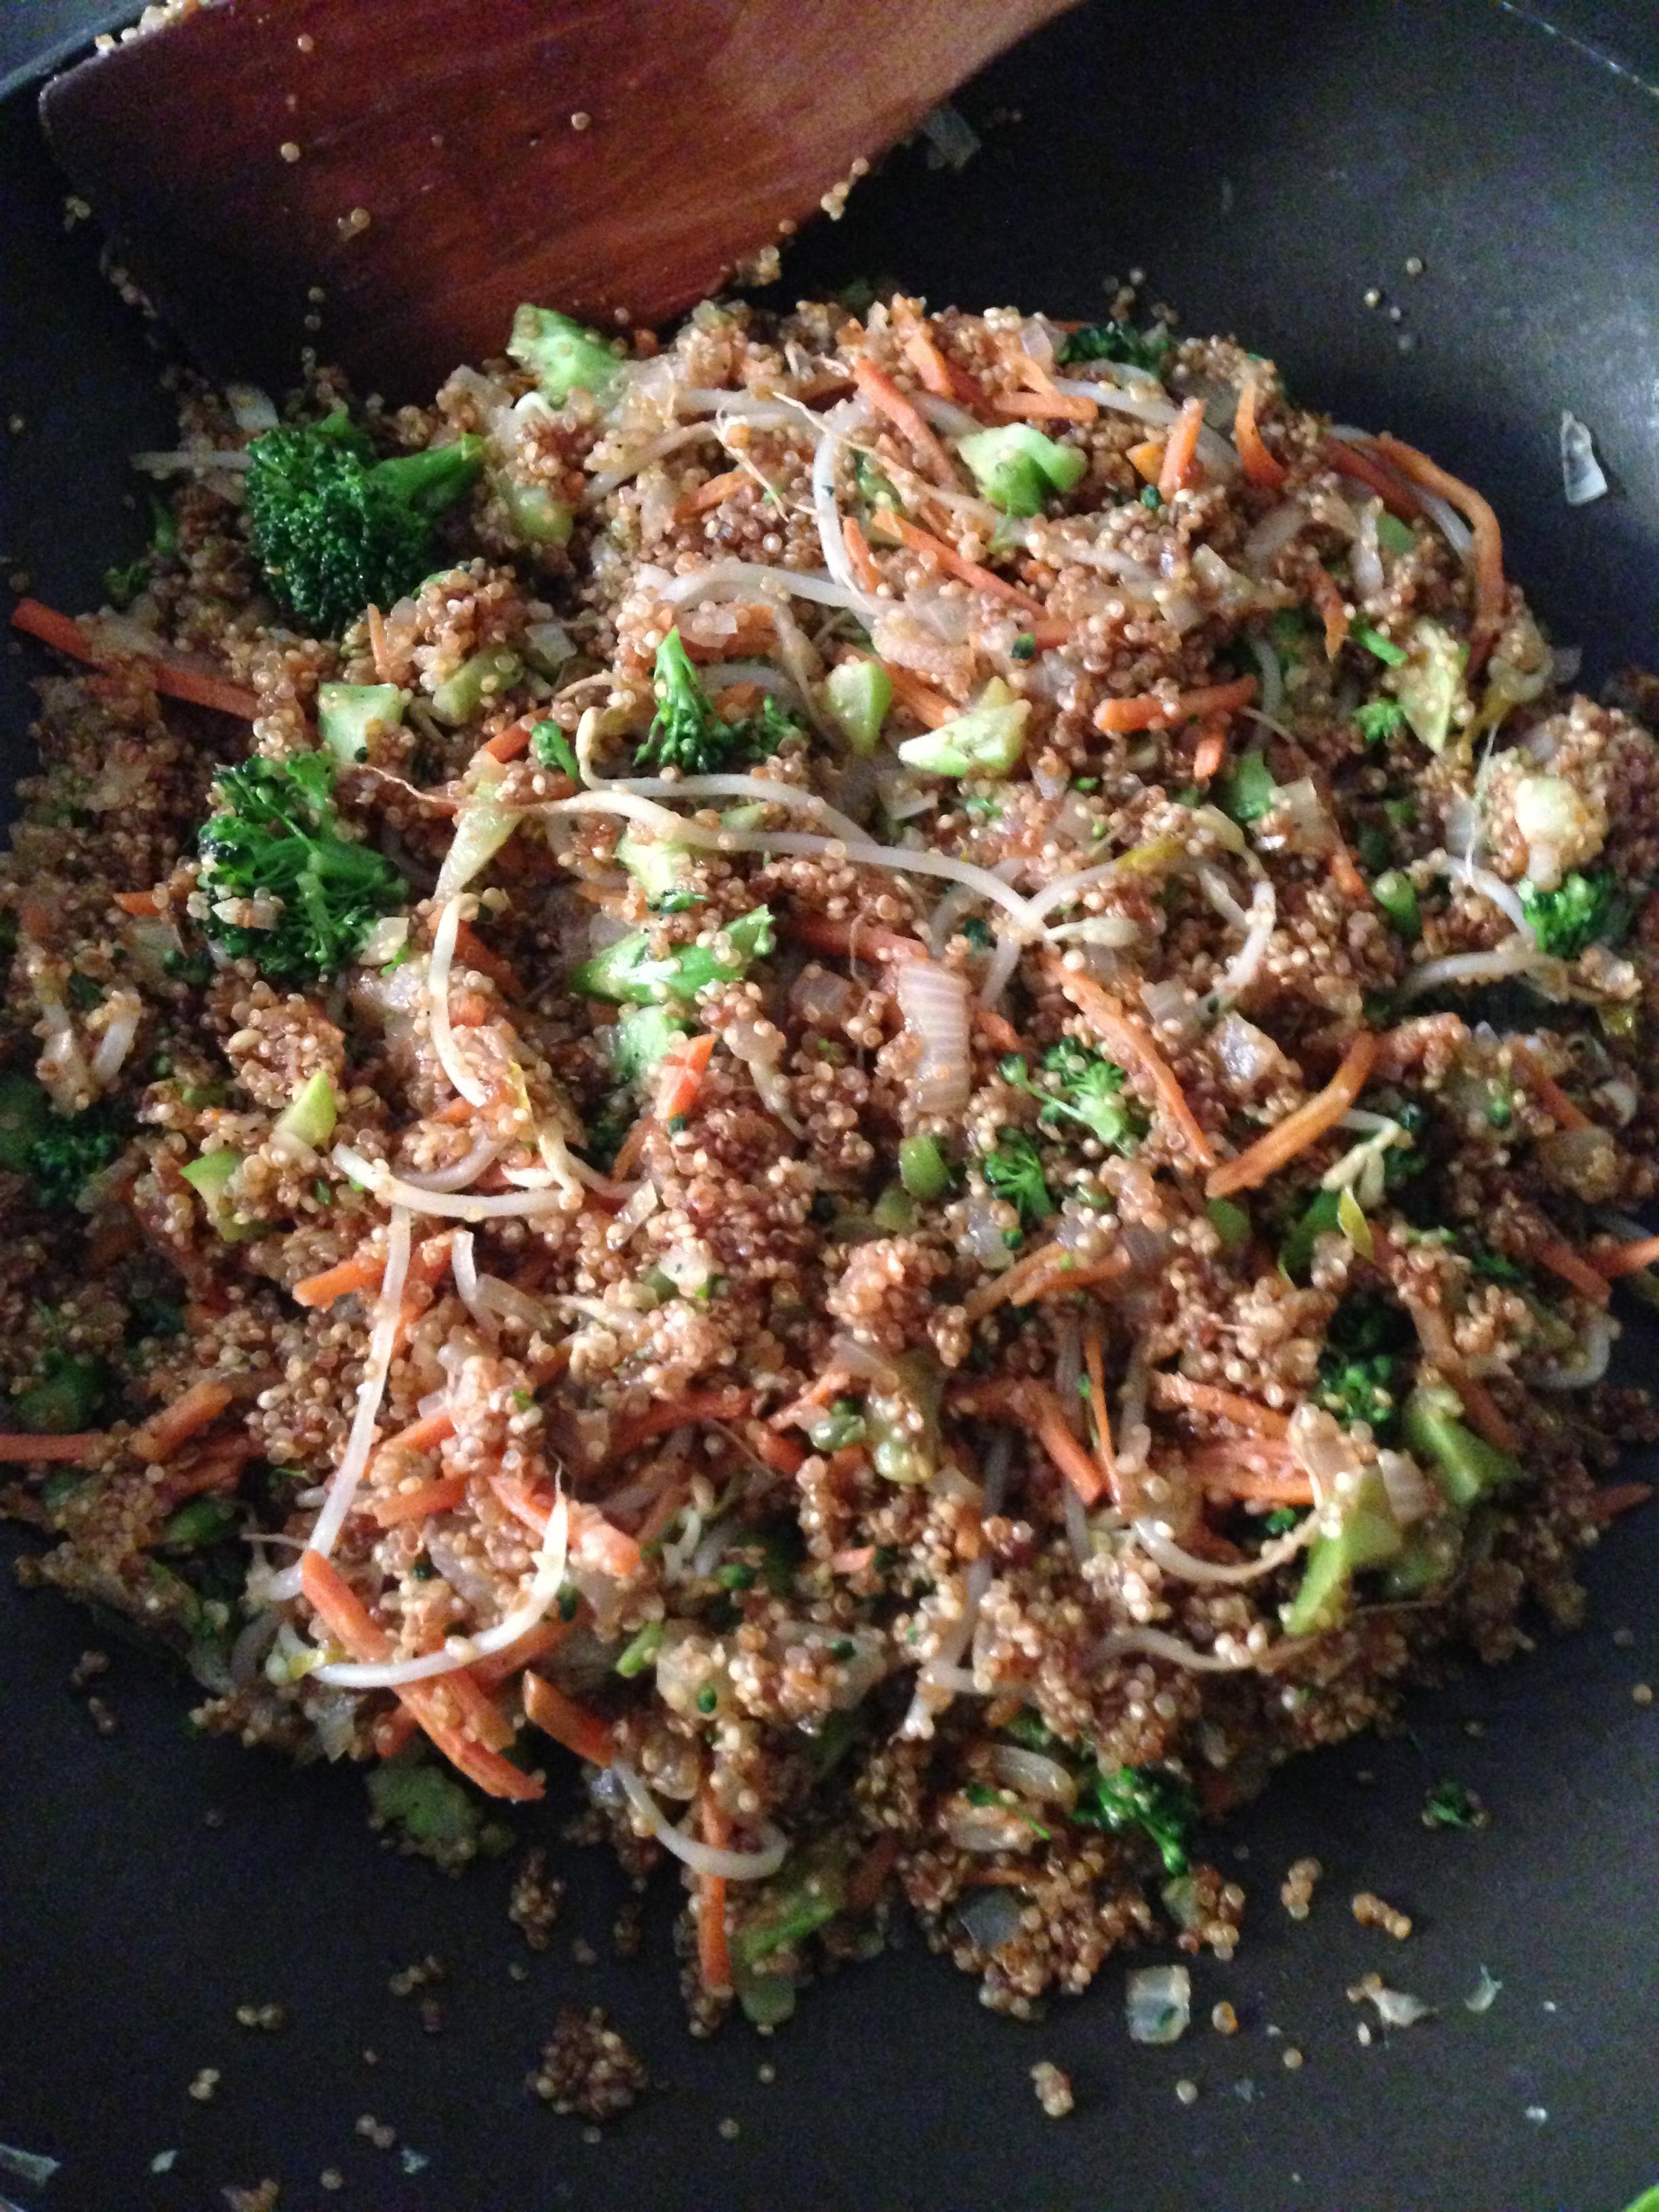 {Asian night – vegan style: quinoa stuffed lettuce wraps with hot peanut sauce}